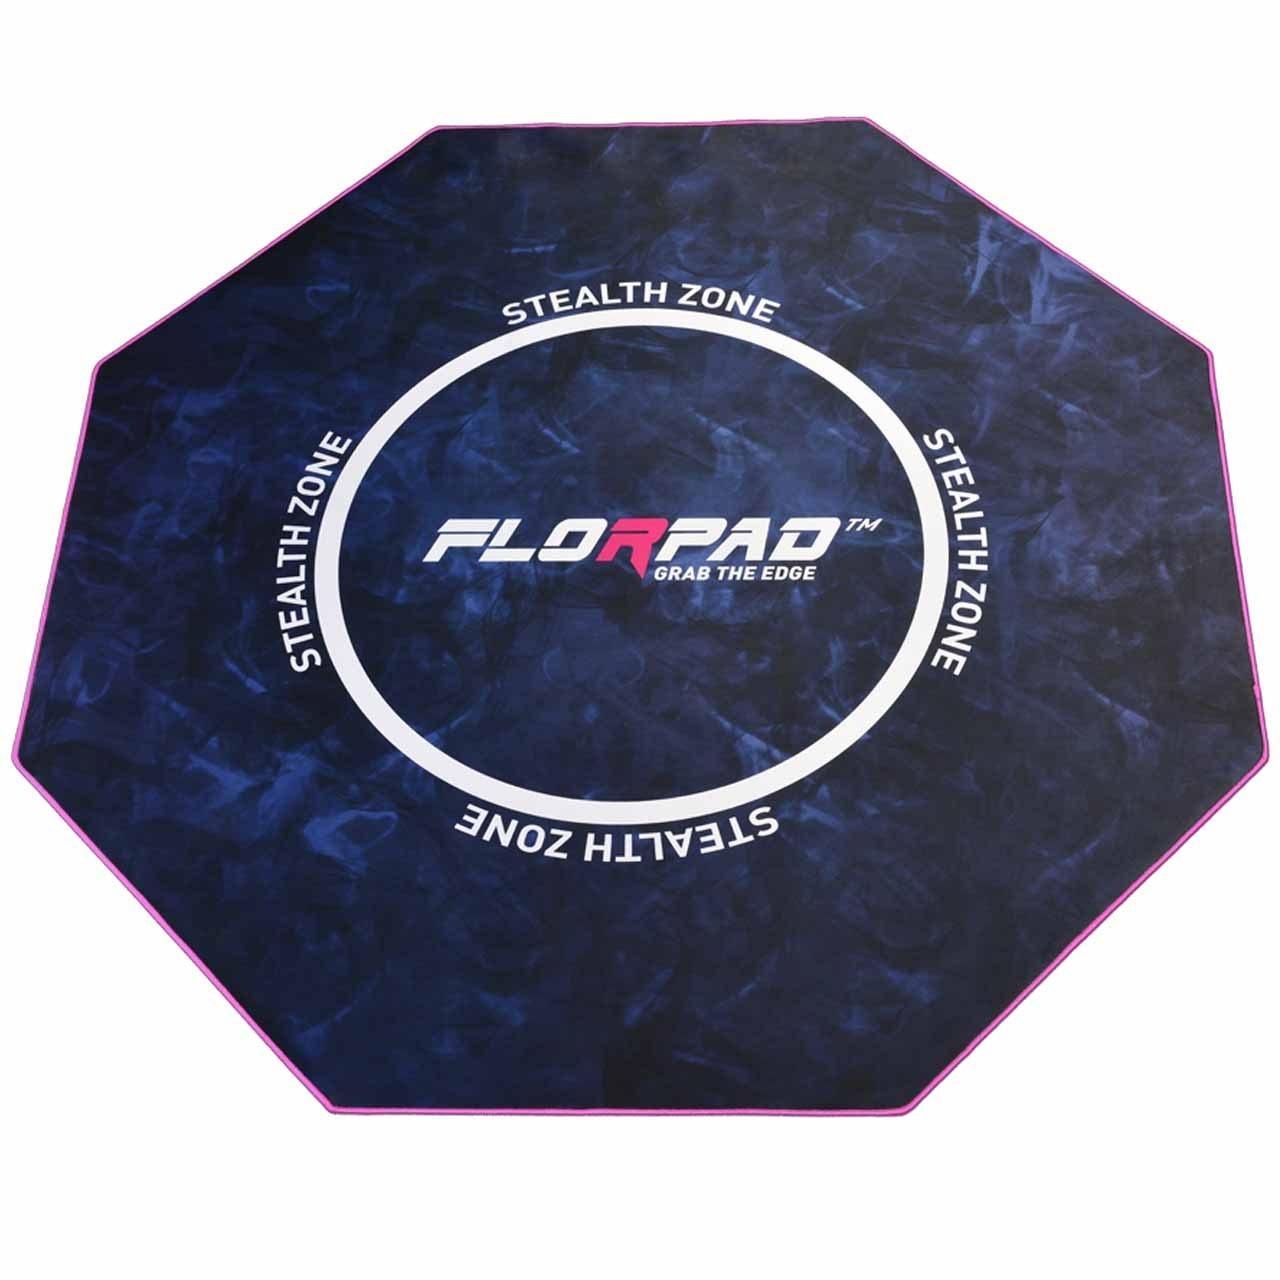 تصویر پد صندلی گیمینگ فلورپد طرح  FlorPad Stealth Zone